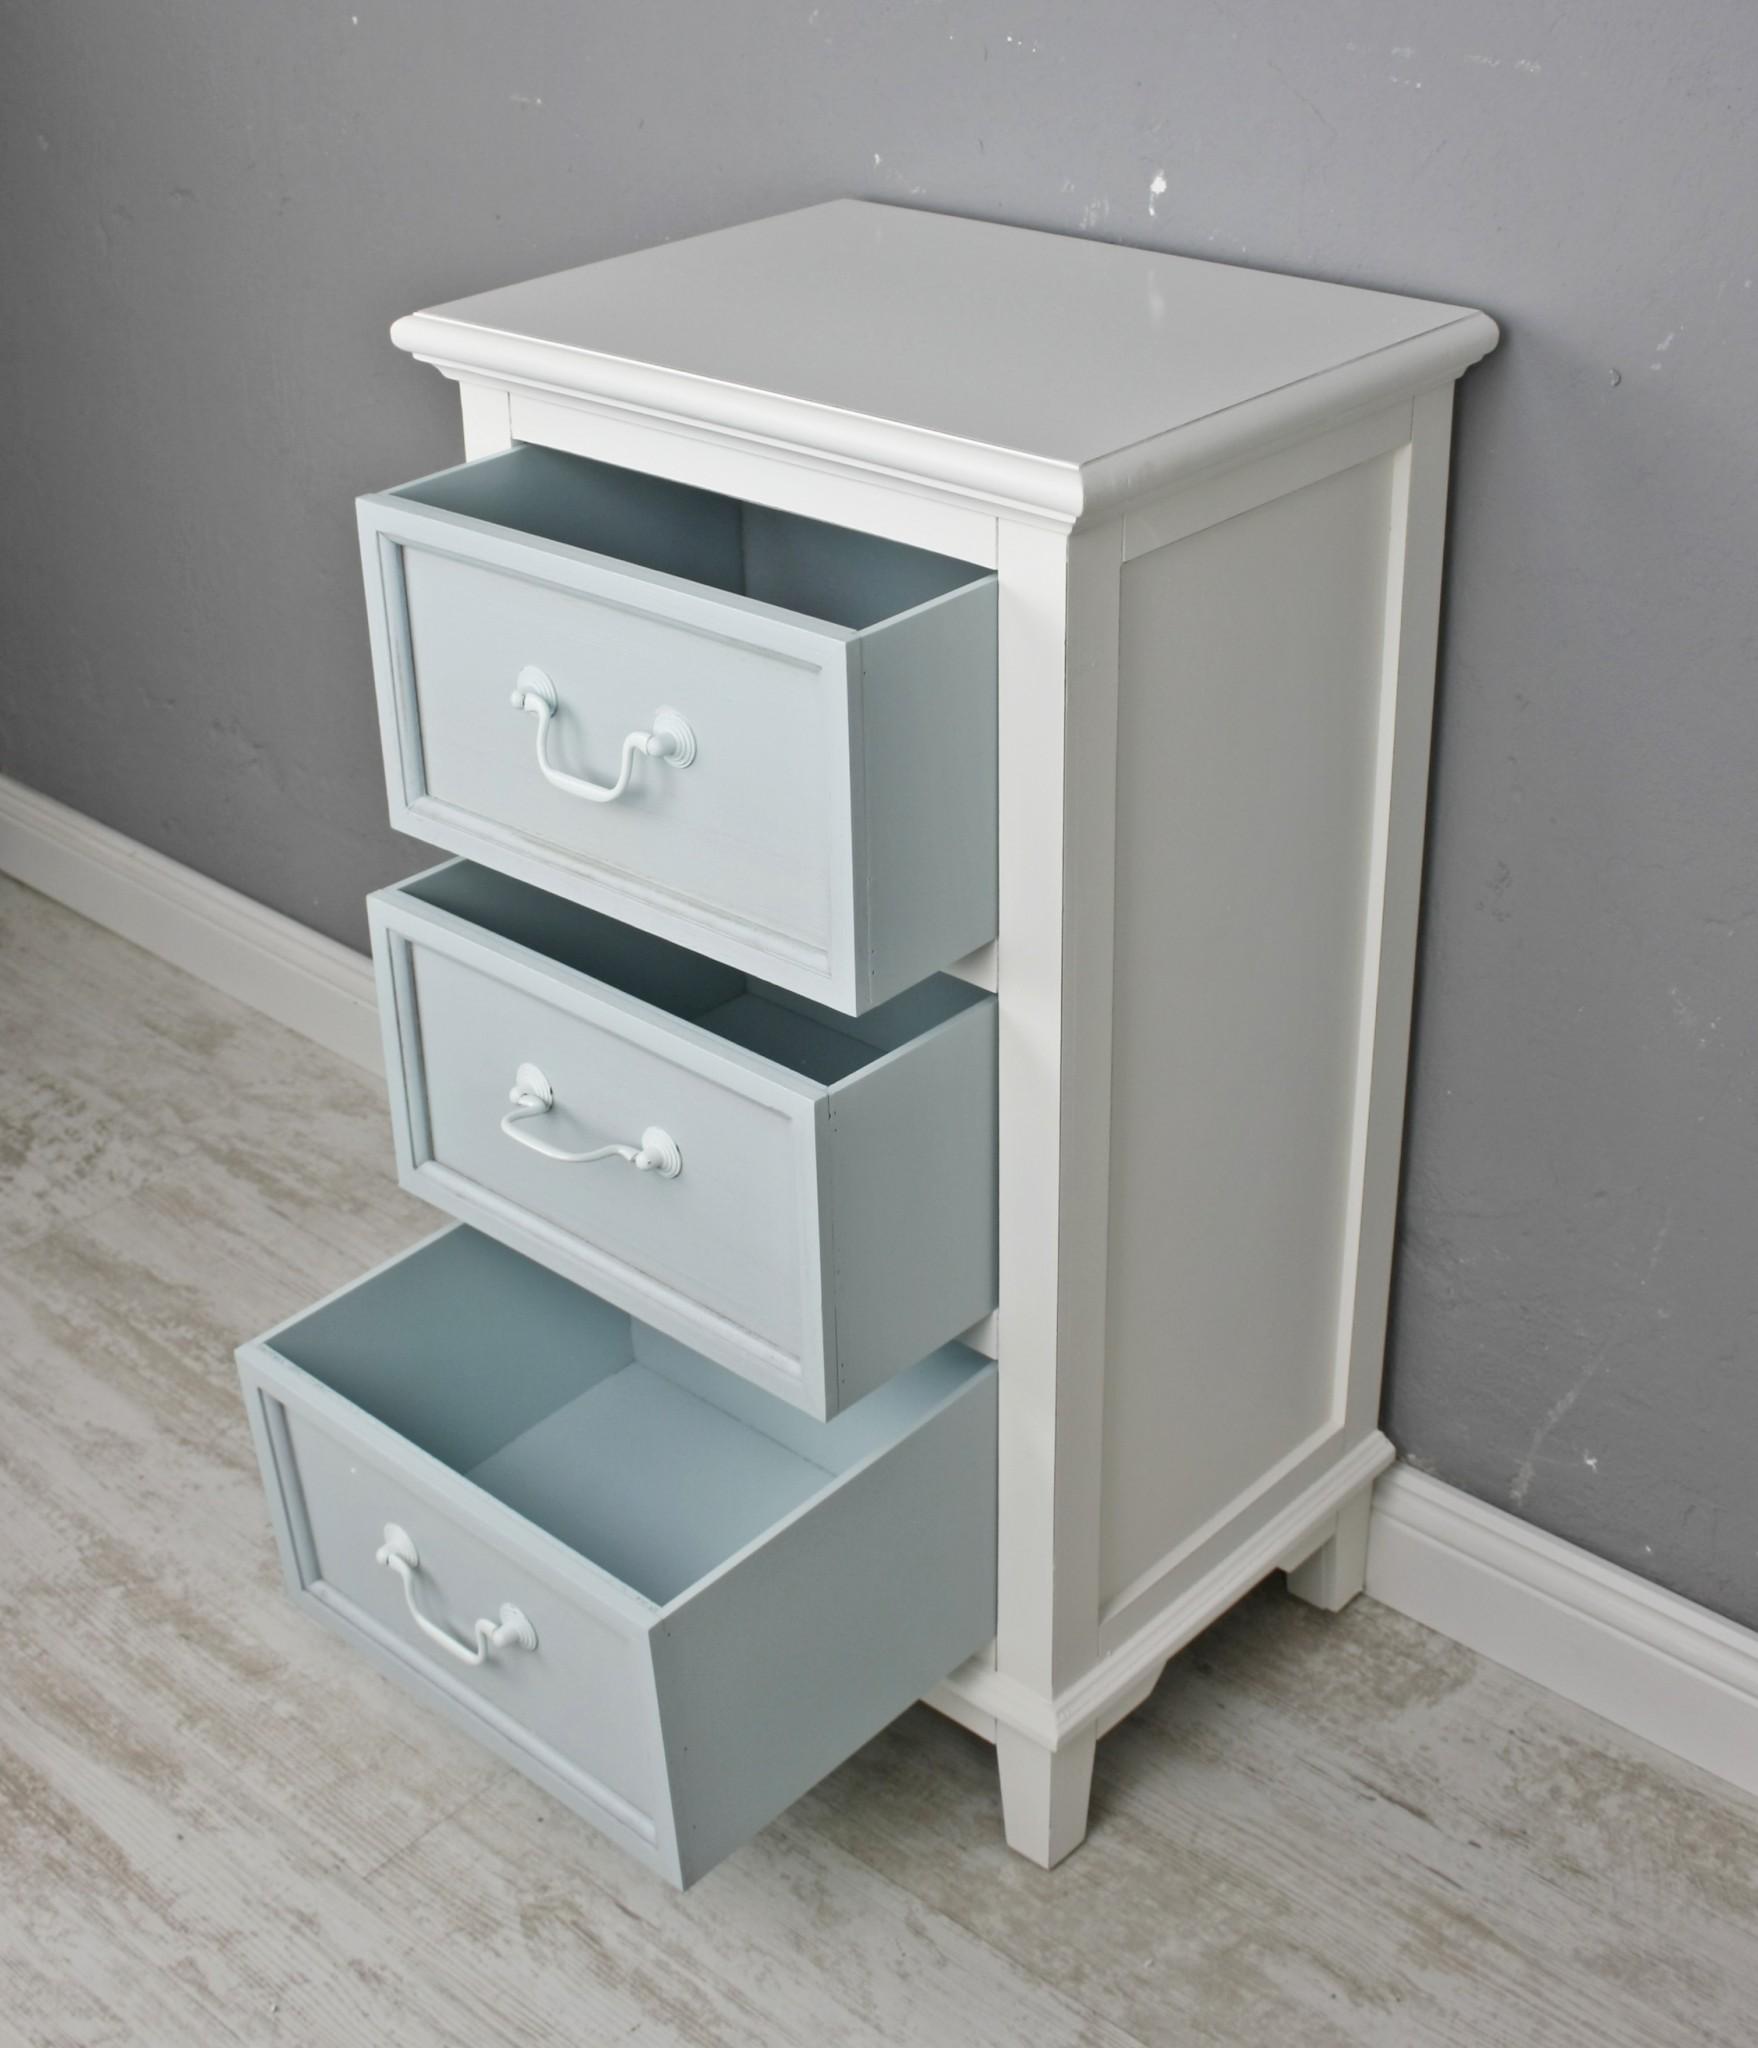 kommode 3 schubladen wei blau. Black Bedroom Furniture Sets. Home Design Ideas